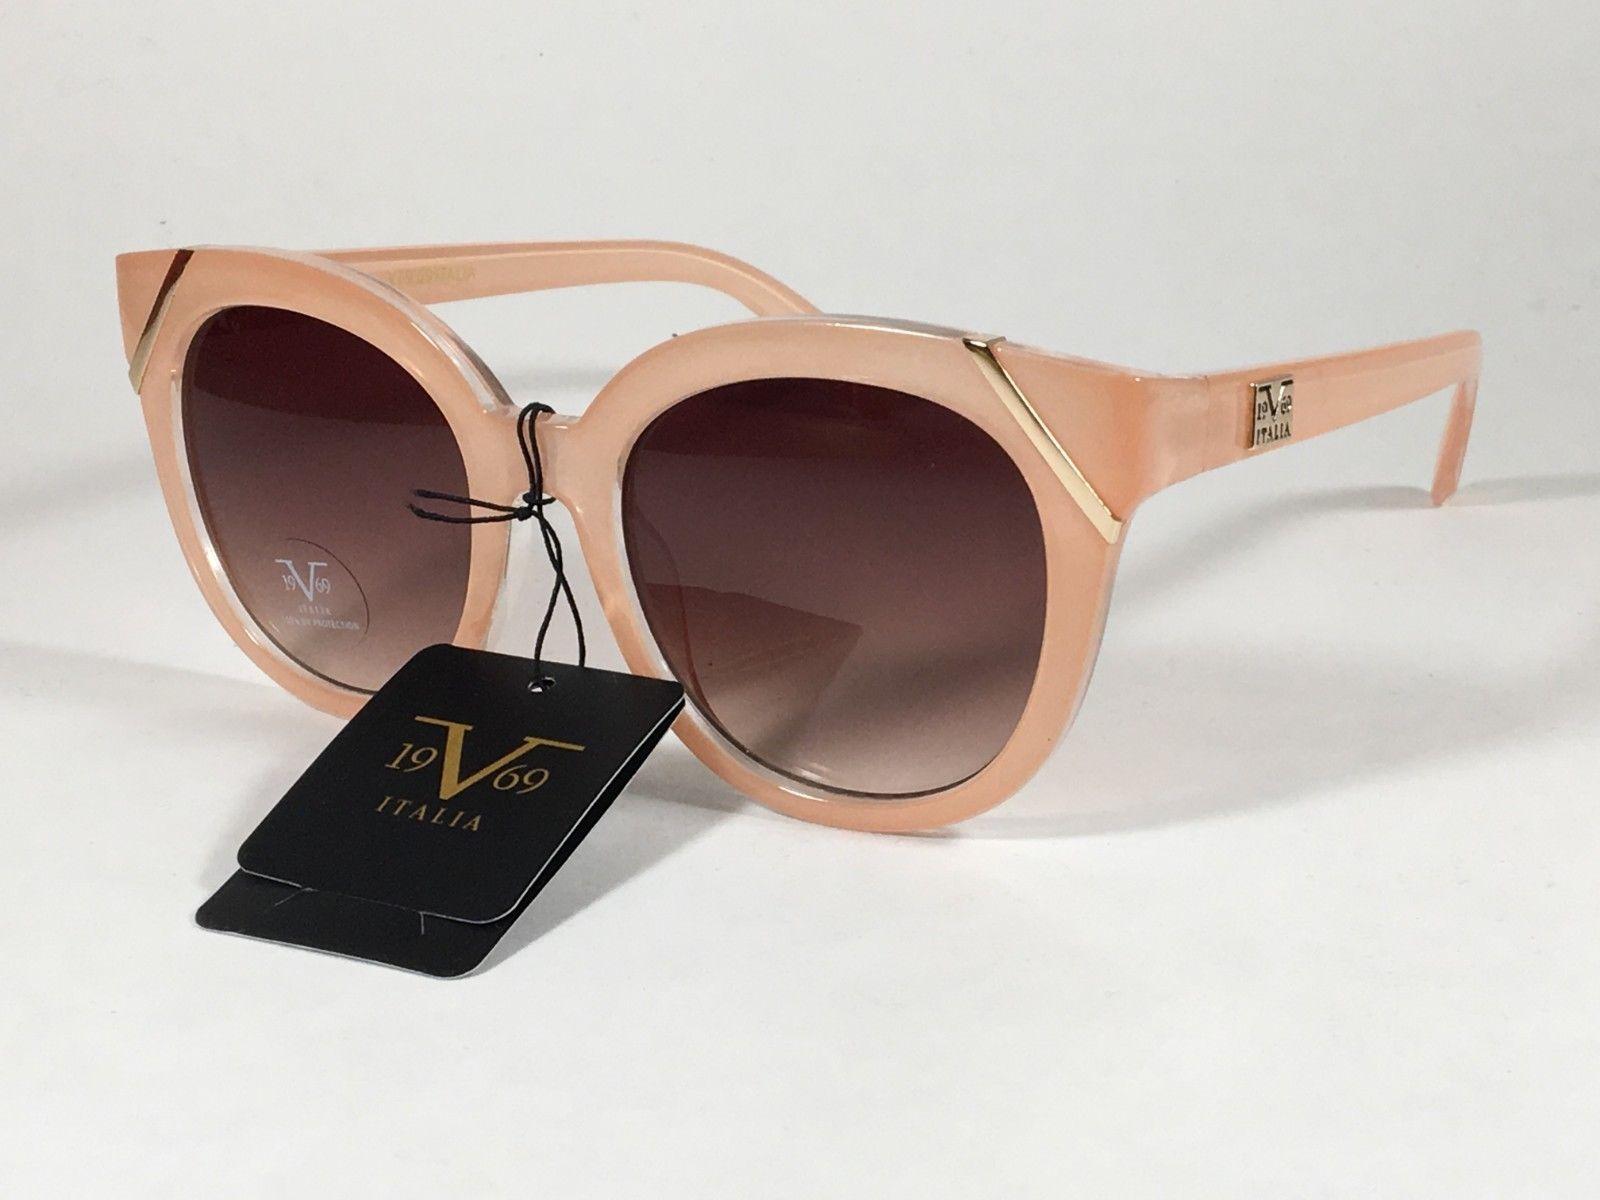 4cca7767e91 Image 1 of 4. VERSACE 1969 Abbigliamento New V1969 ITALIA Sunglasses